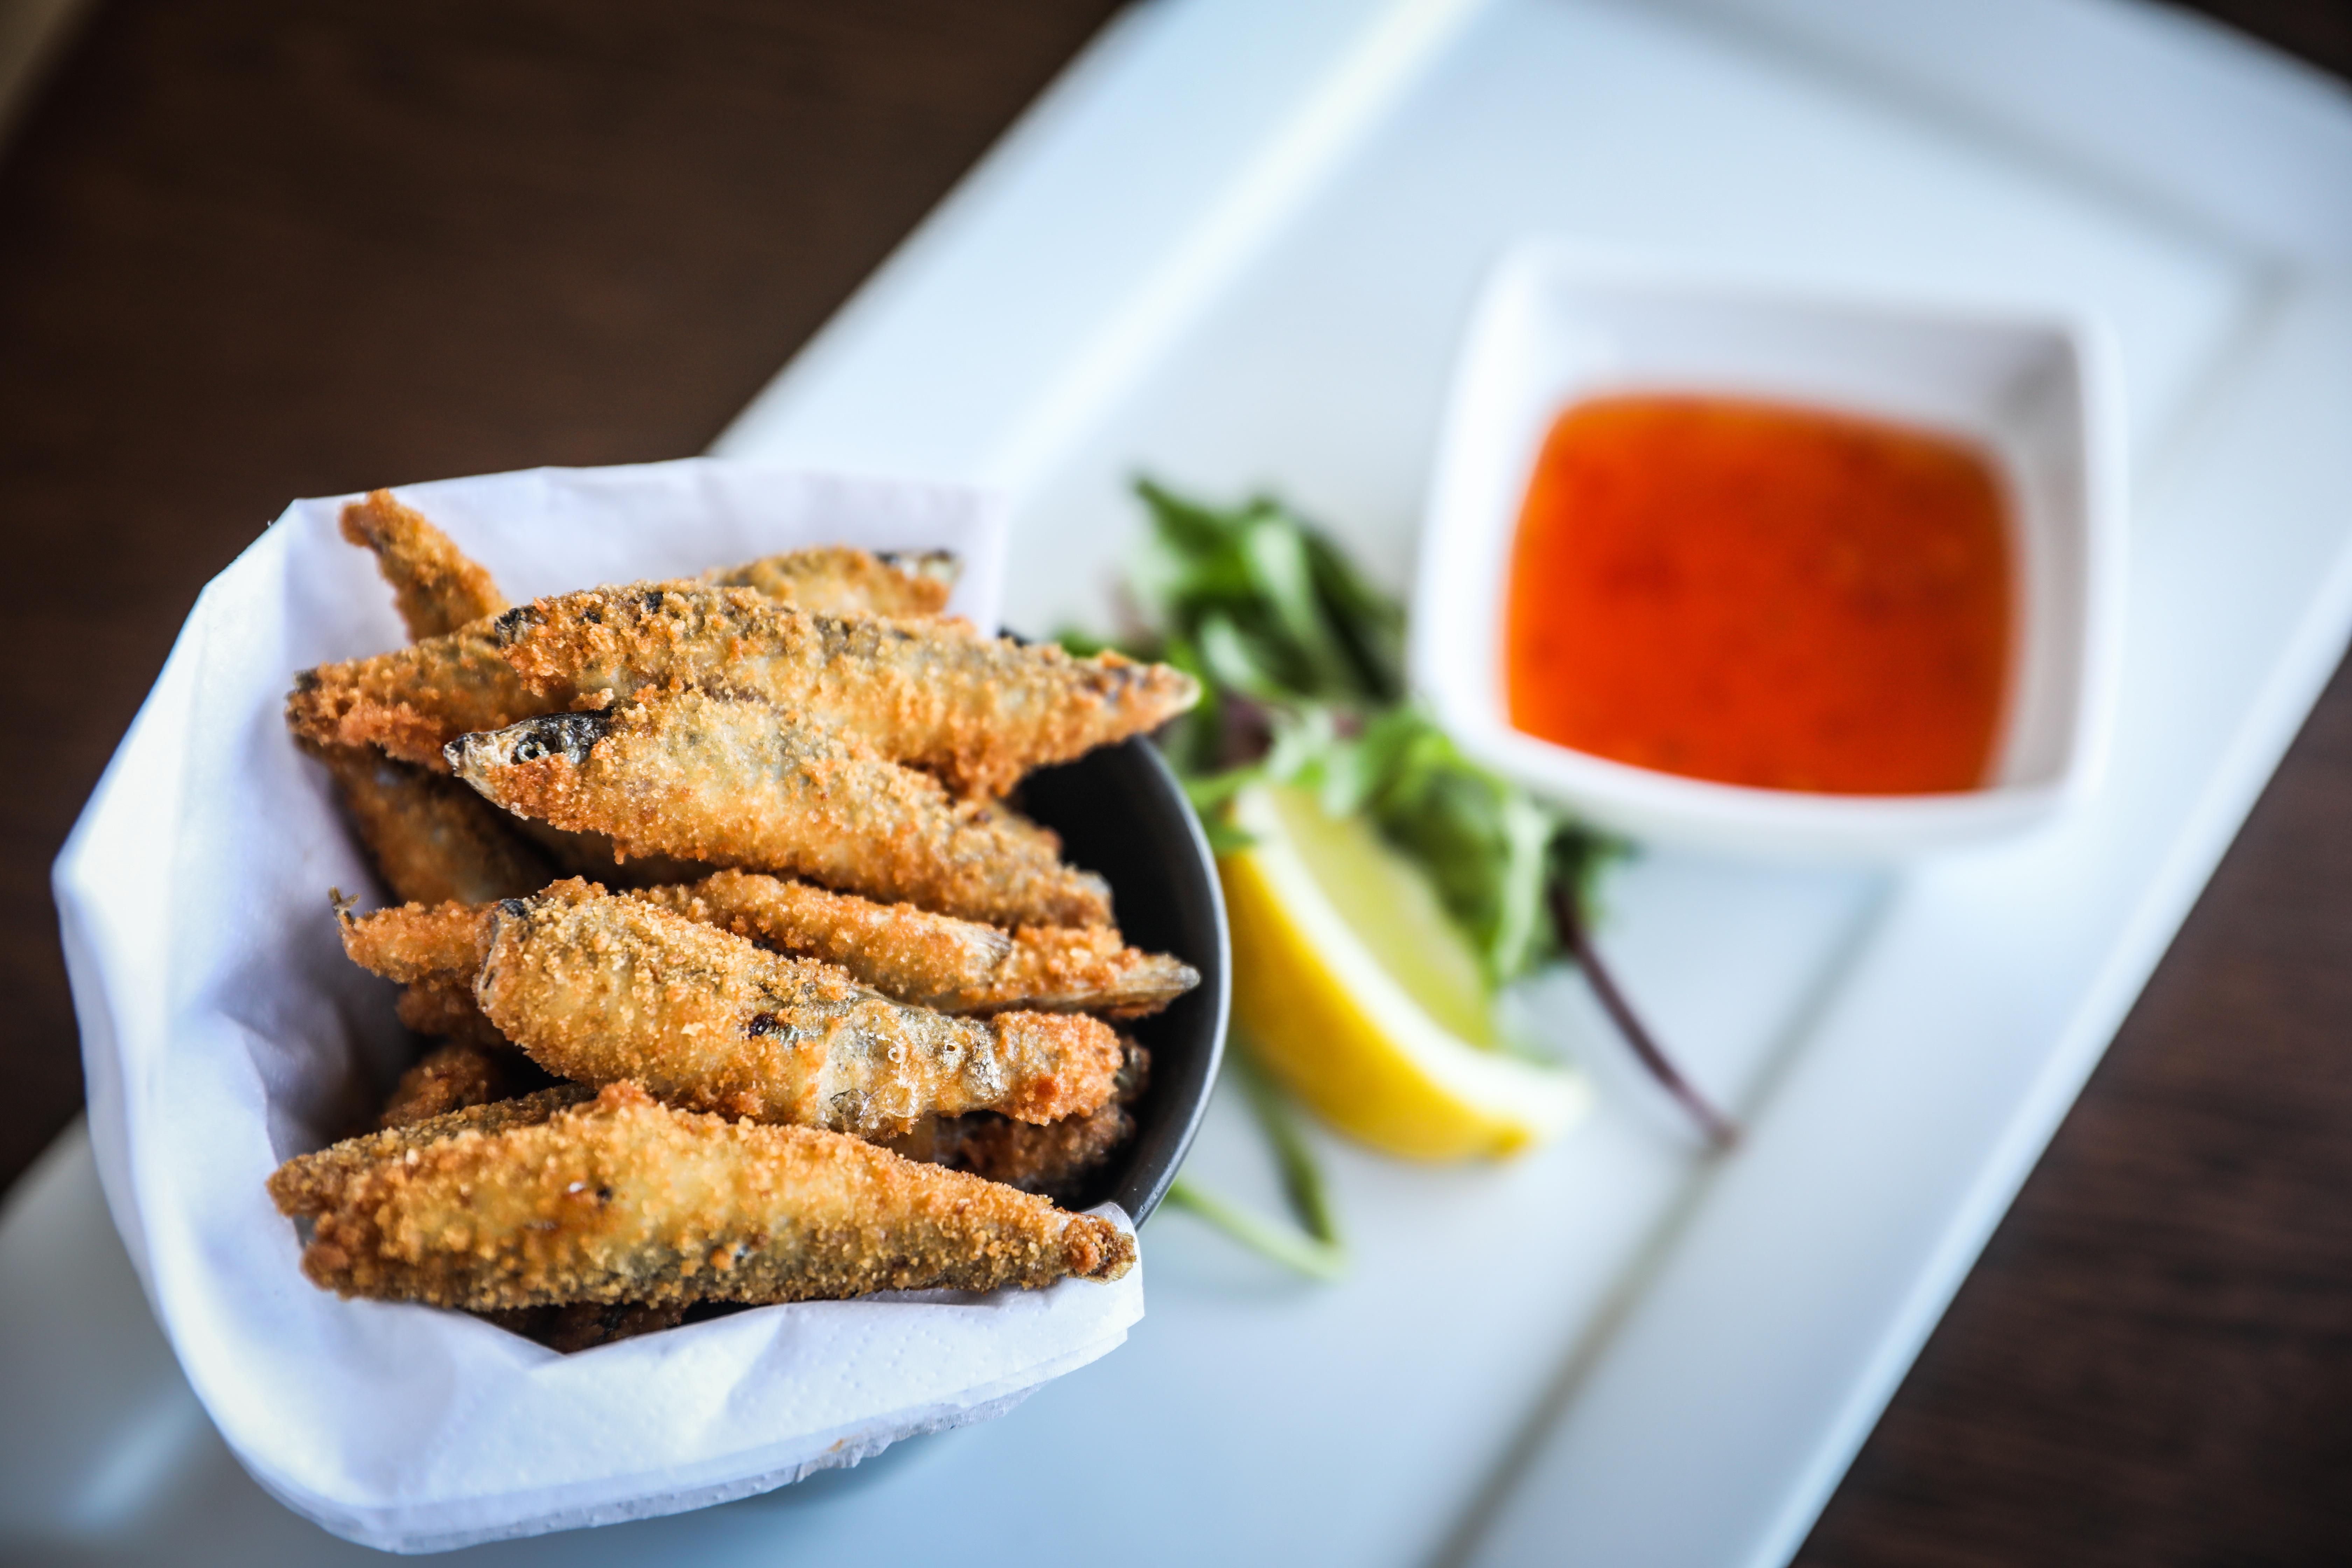 Restaurant review: Blu, Carnoustie 35/50 - The Courier